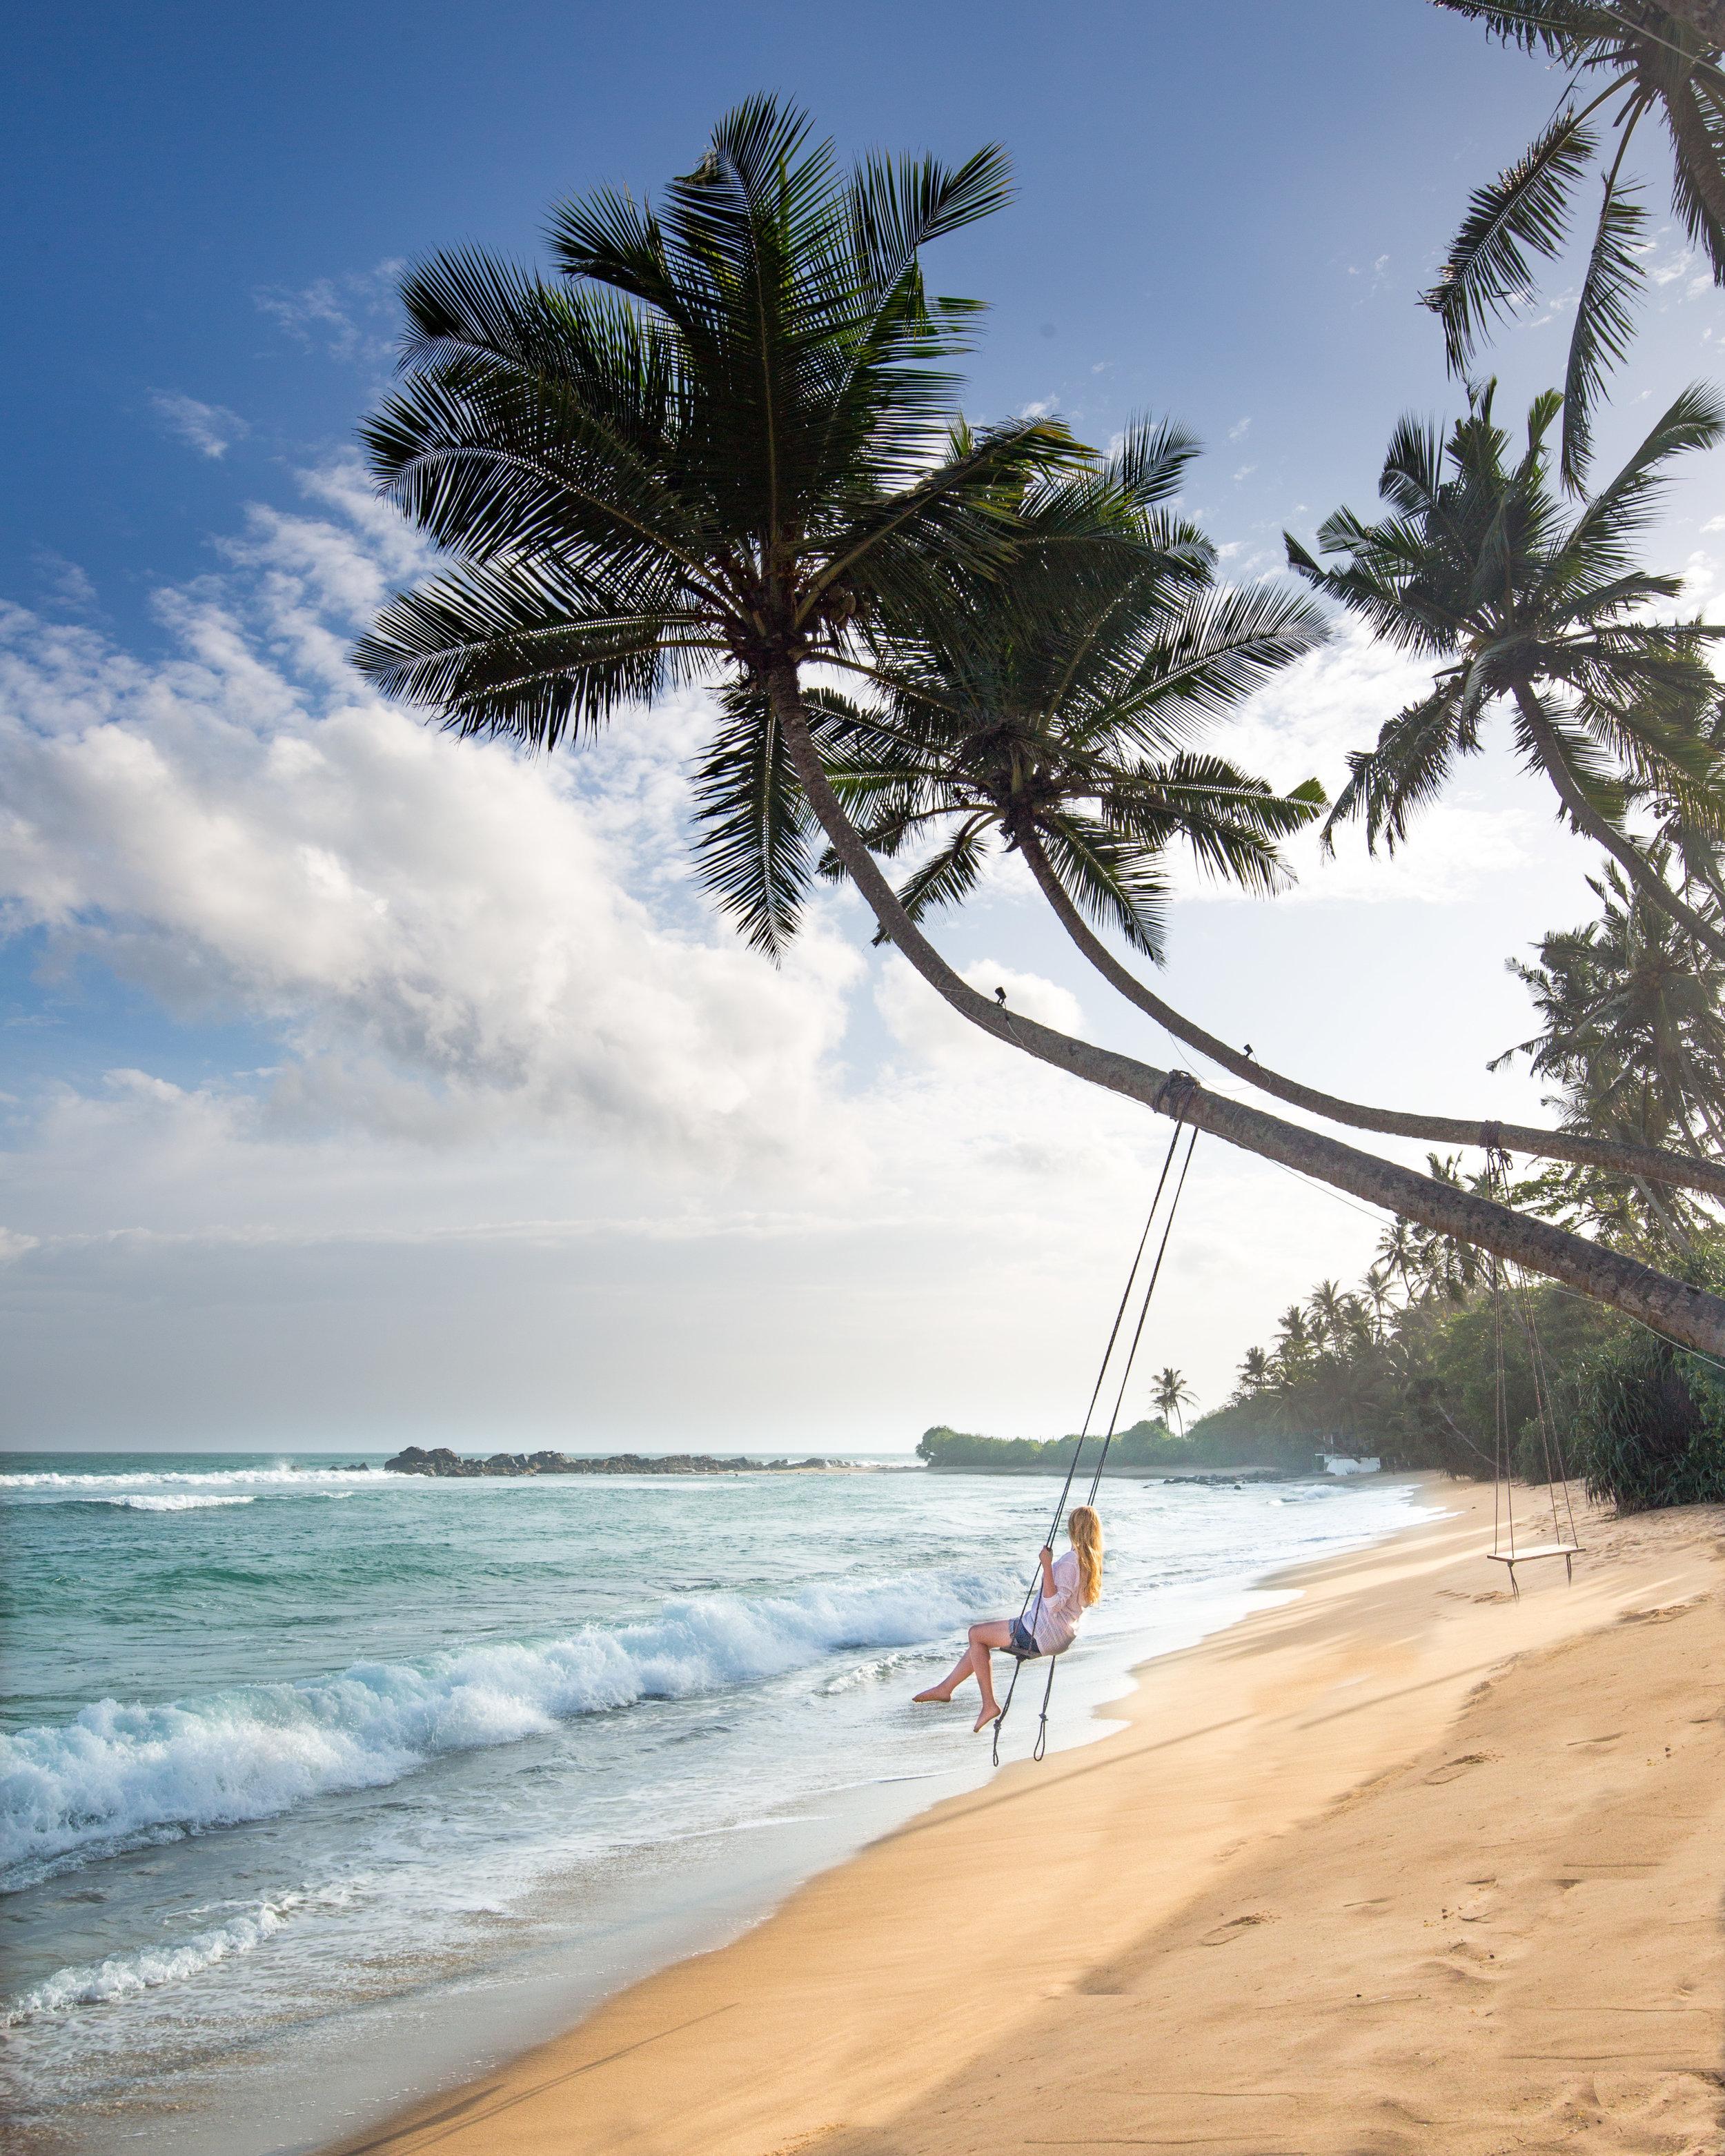 Instagrammable spots in Sri Lanka: Mahi Mahi Beach Swing